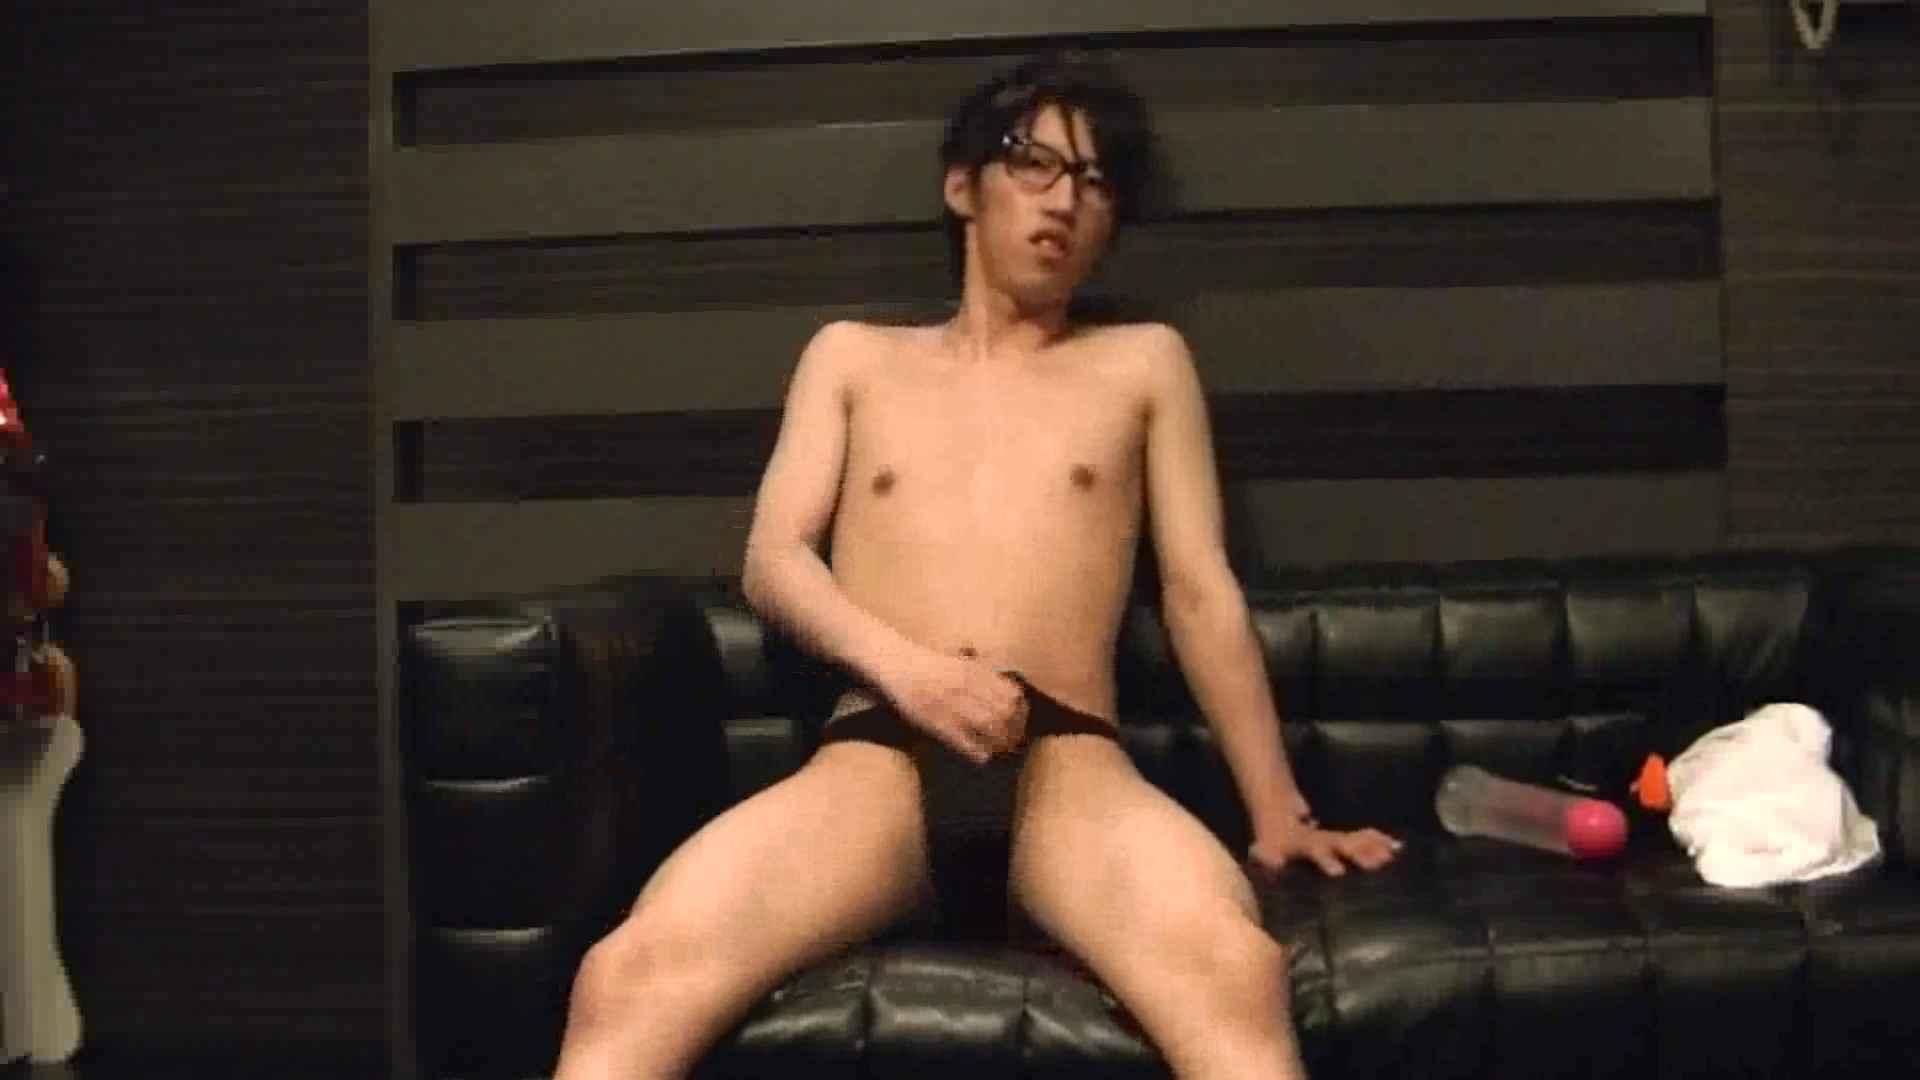 ONA見せカーニバル!! Vol3 男 ゲイ無料無修正画像 89枚 52